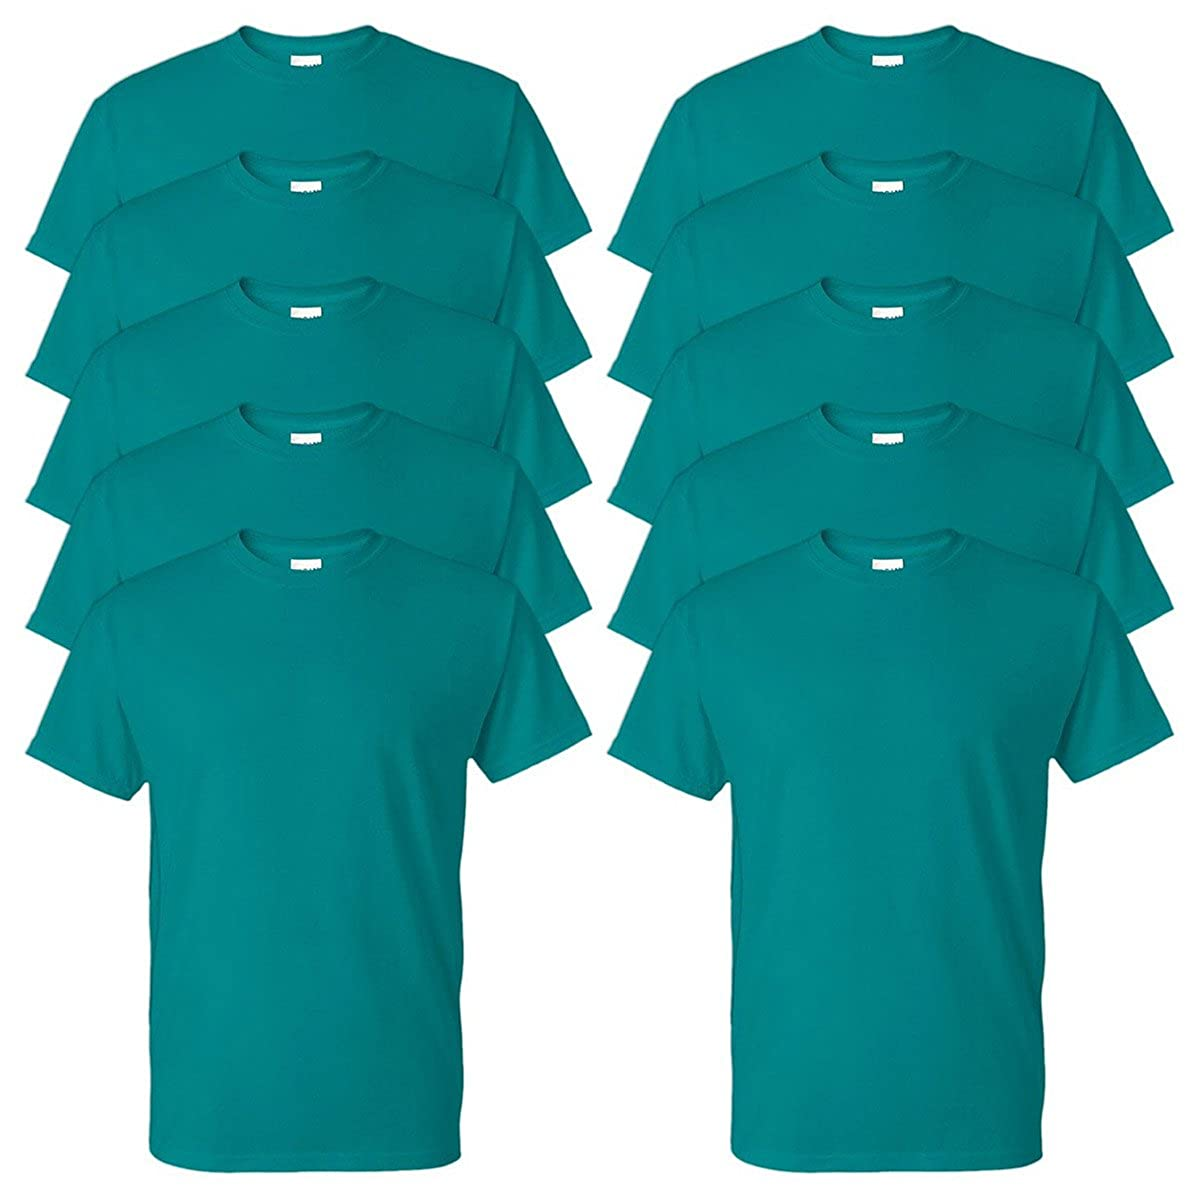 Pack of 10 Gildan Adult DryBlend Sports T-Shirt Jade Dome XL